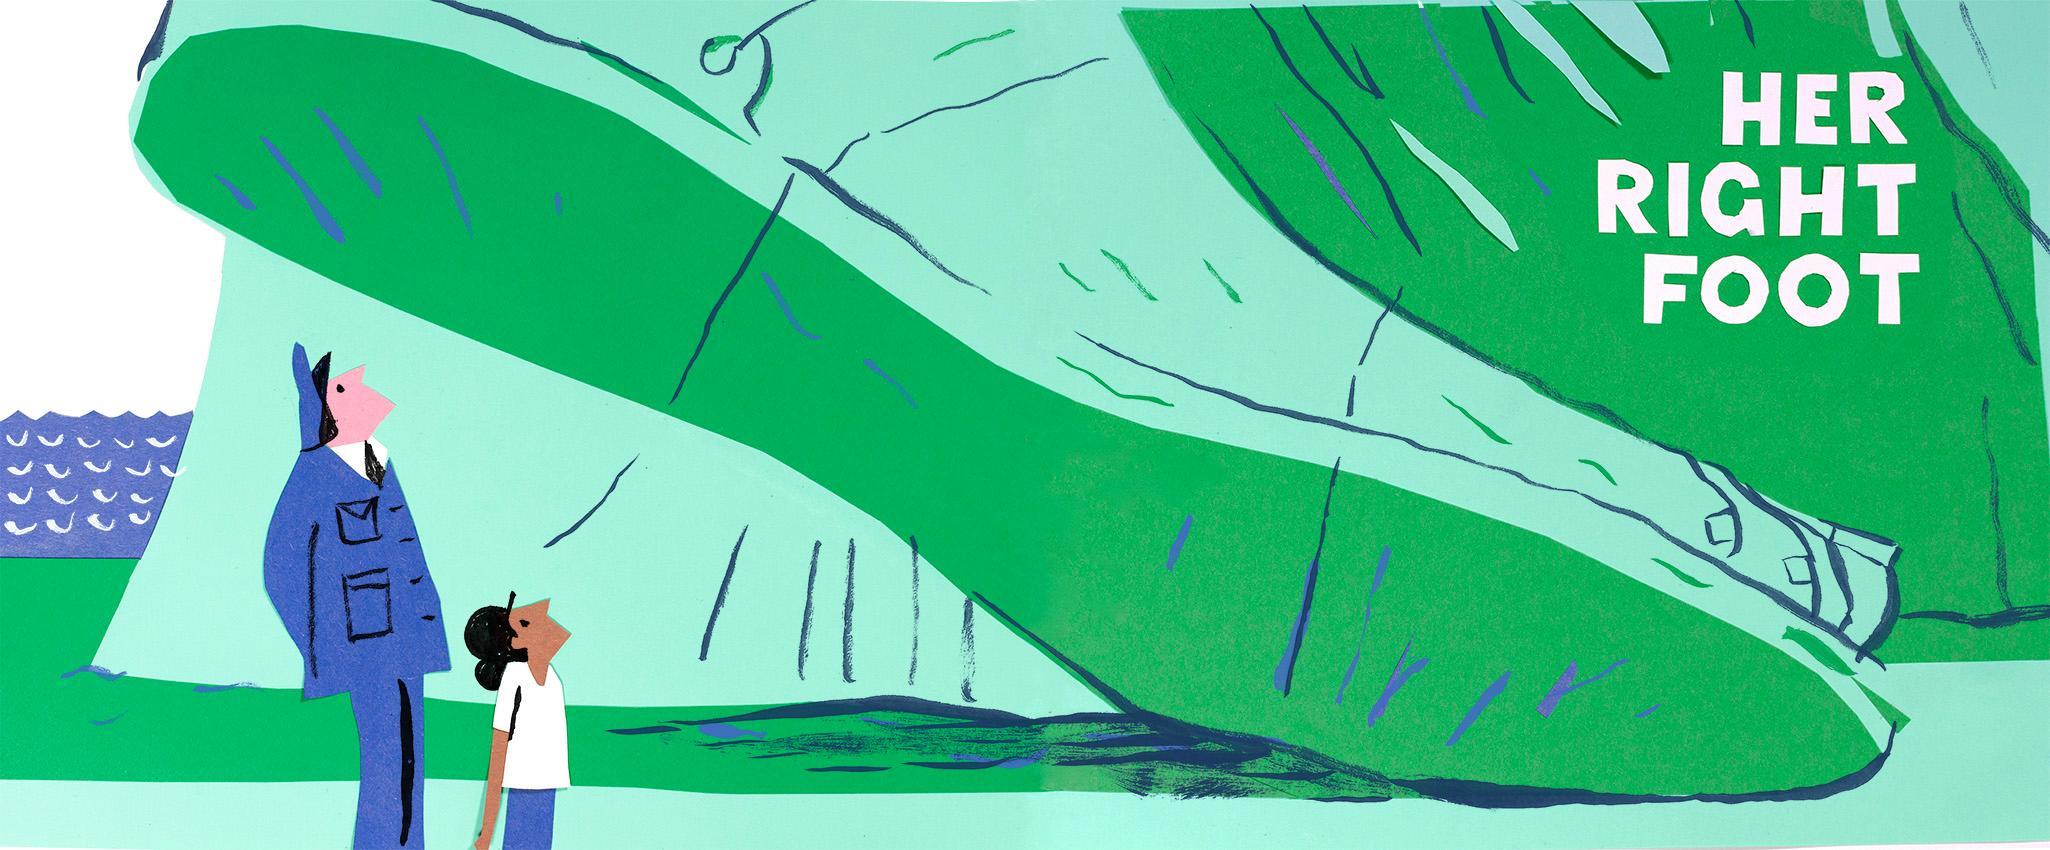 thumbnail foot.jpg